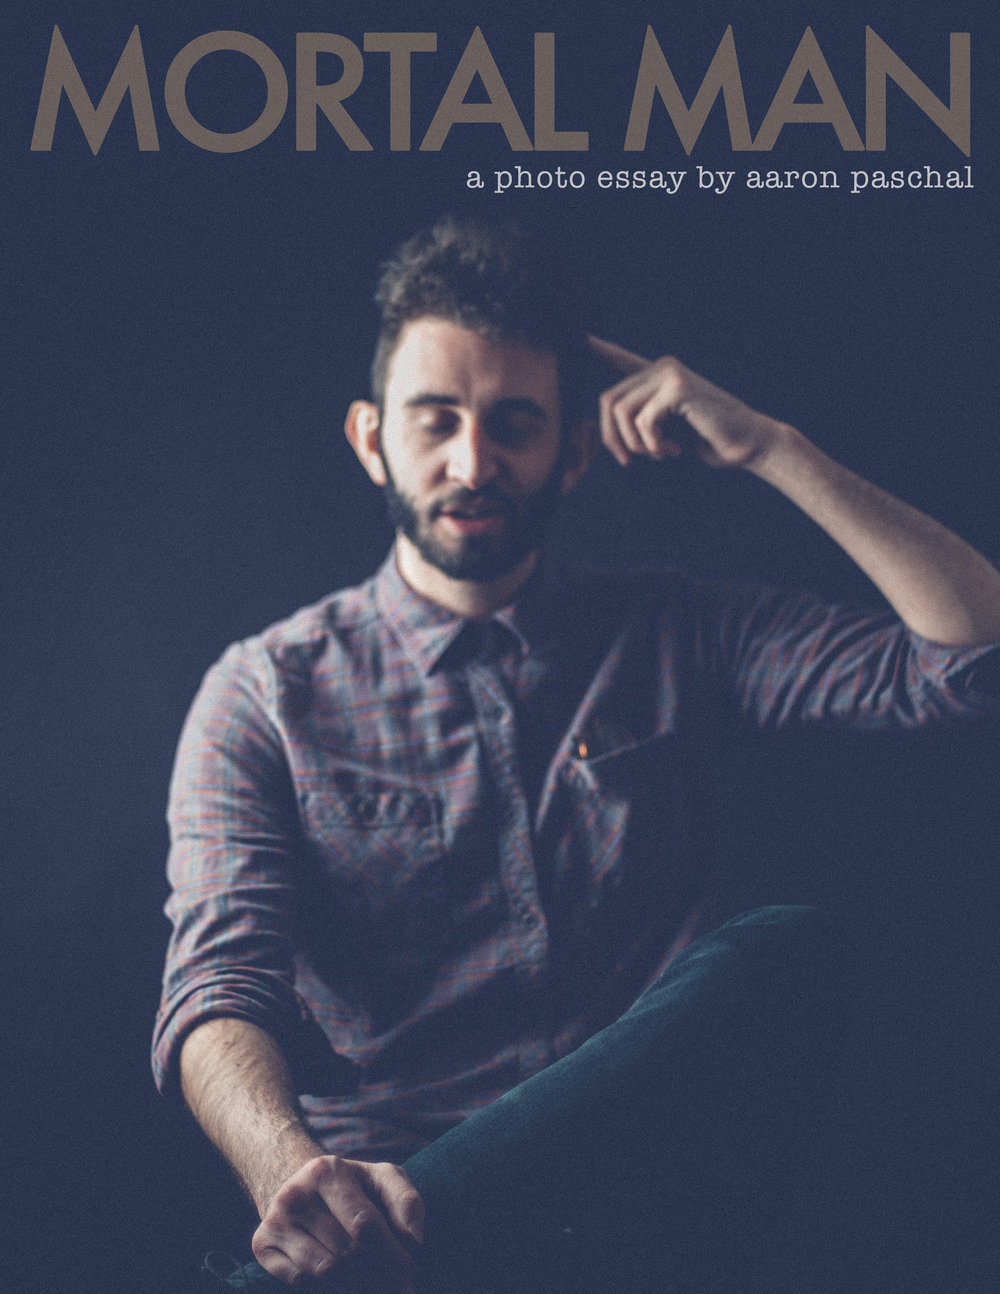 Zack Cover